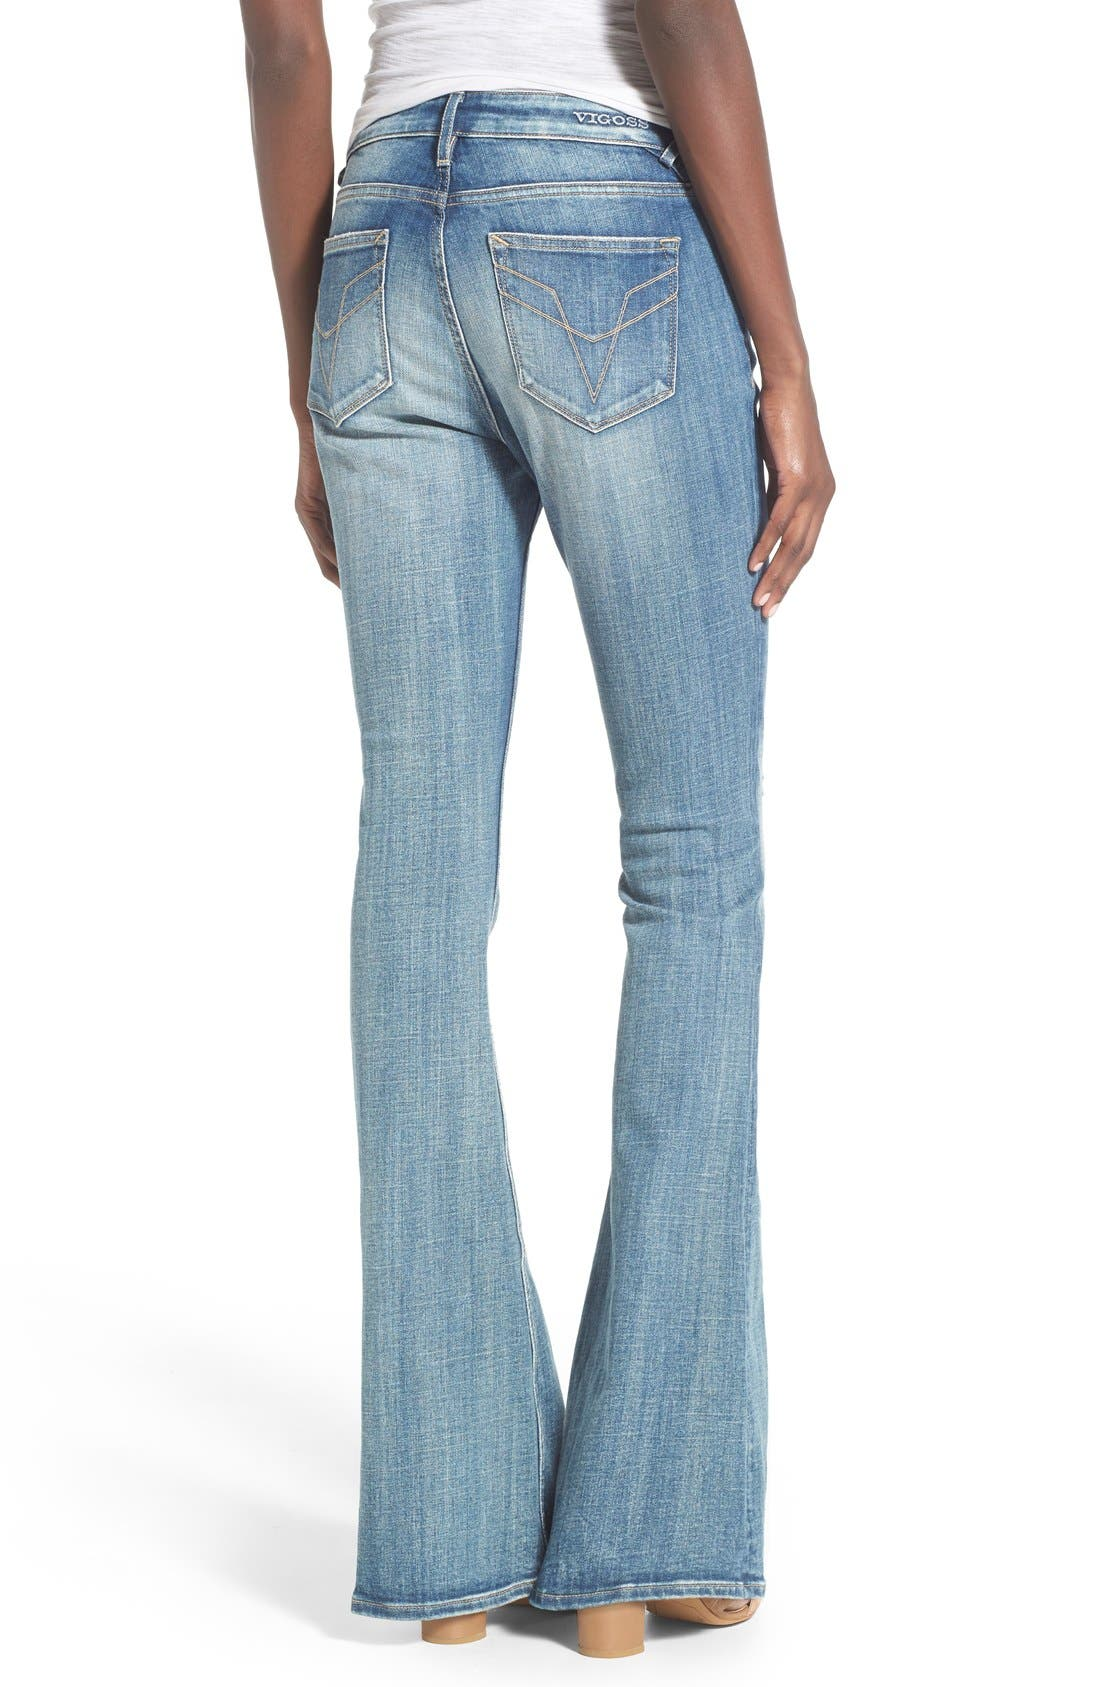 Alternate Image 2  - Vigoss 'Chelsea' Flare Jeans (Medium Wash)